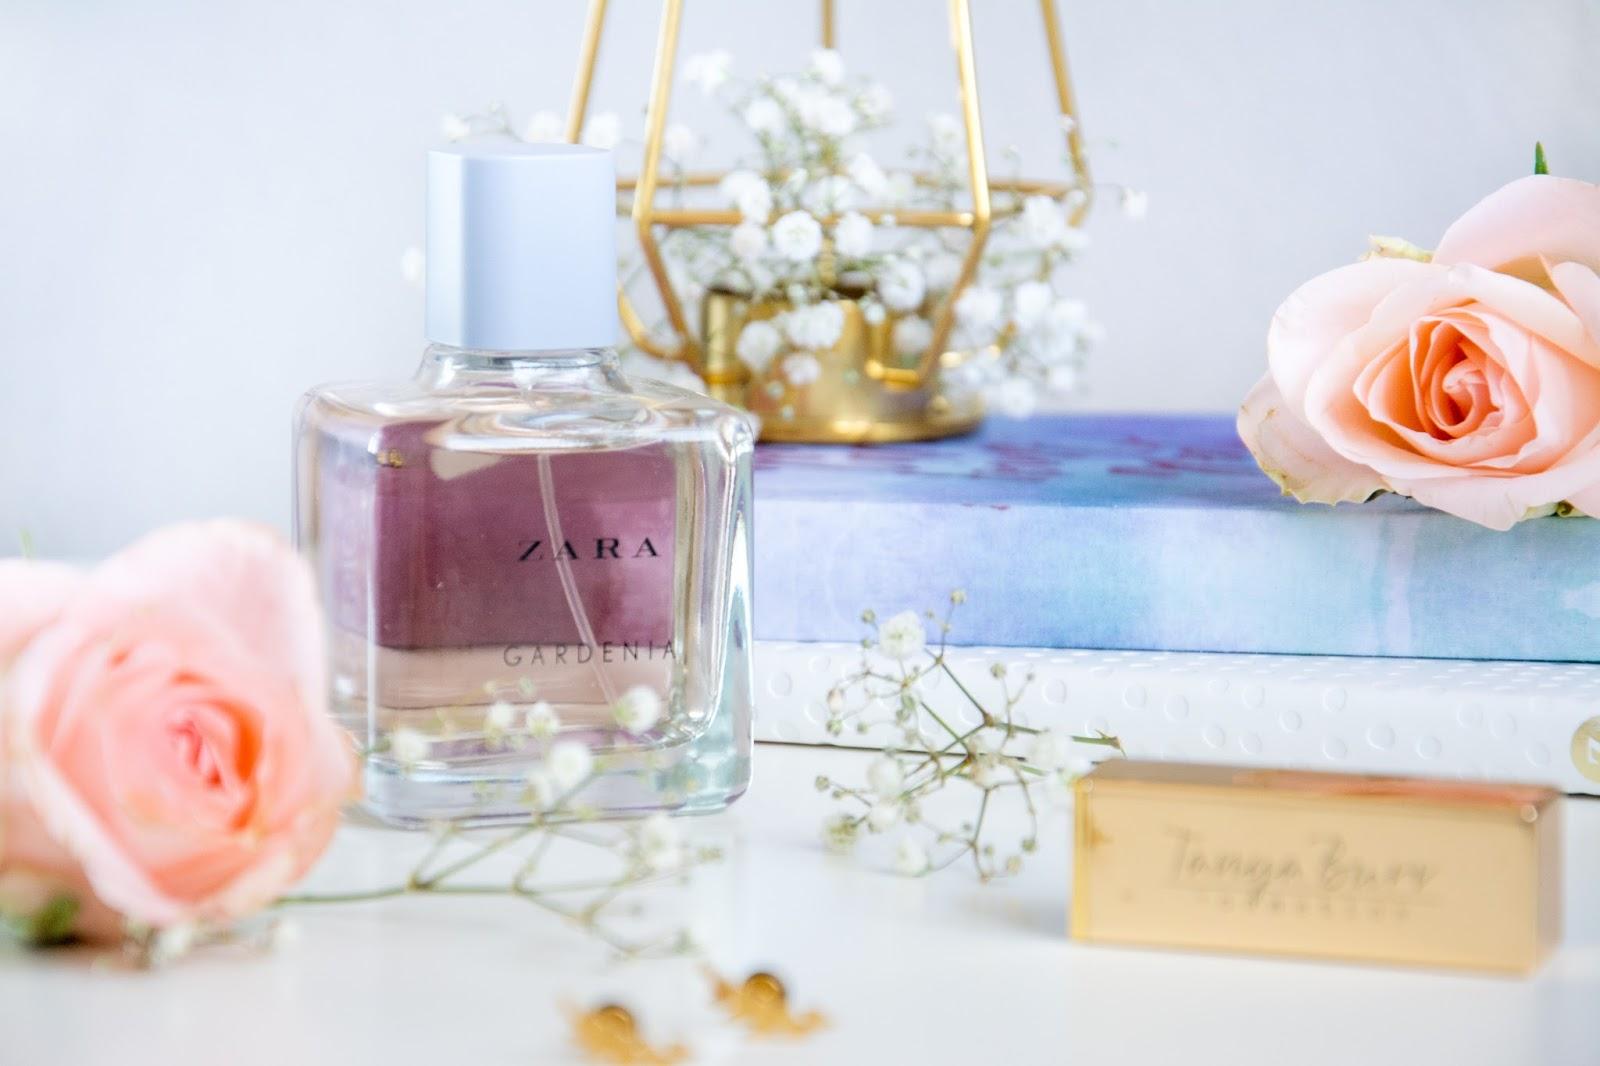 Zara Gardenia Perfume; Happiness Boutique Leafy Fern Earrings; Tanya Burr Lipstick Pink Cocoa; Ikea Geometric Candle Holder; Hema Patel Notebook; Zoella Notebook; Fresh Roses